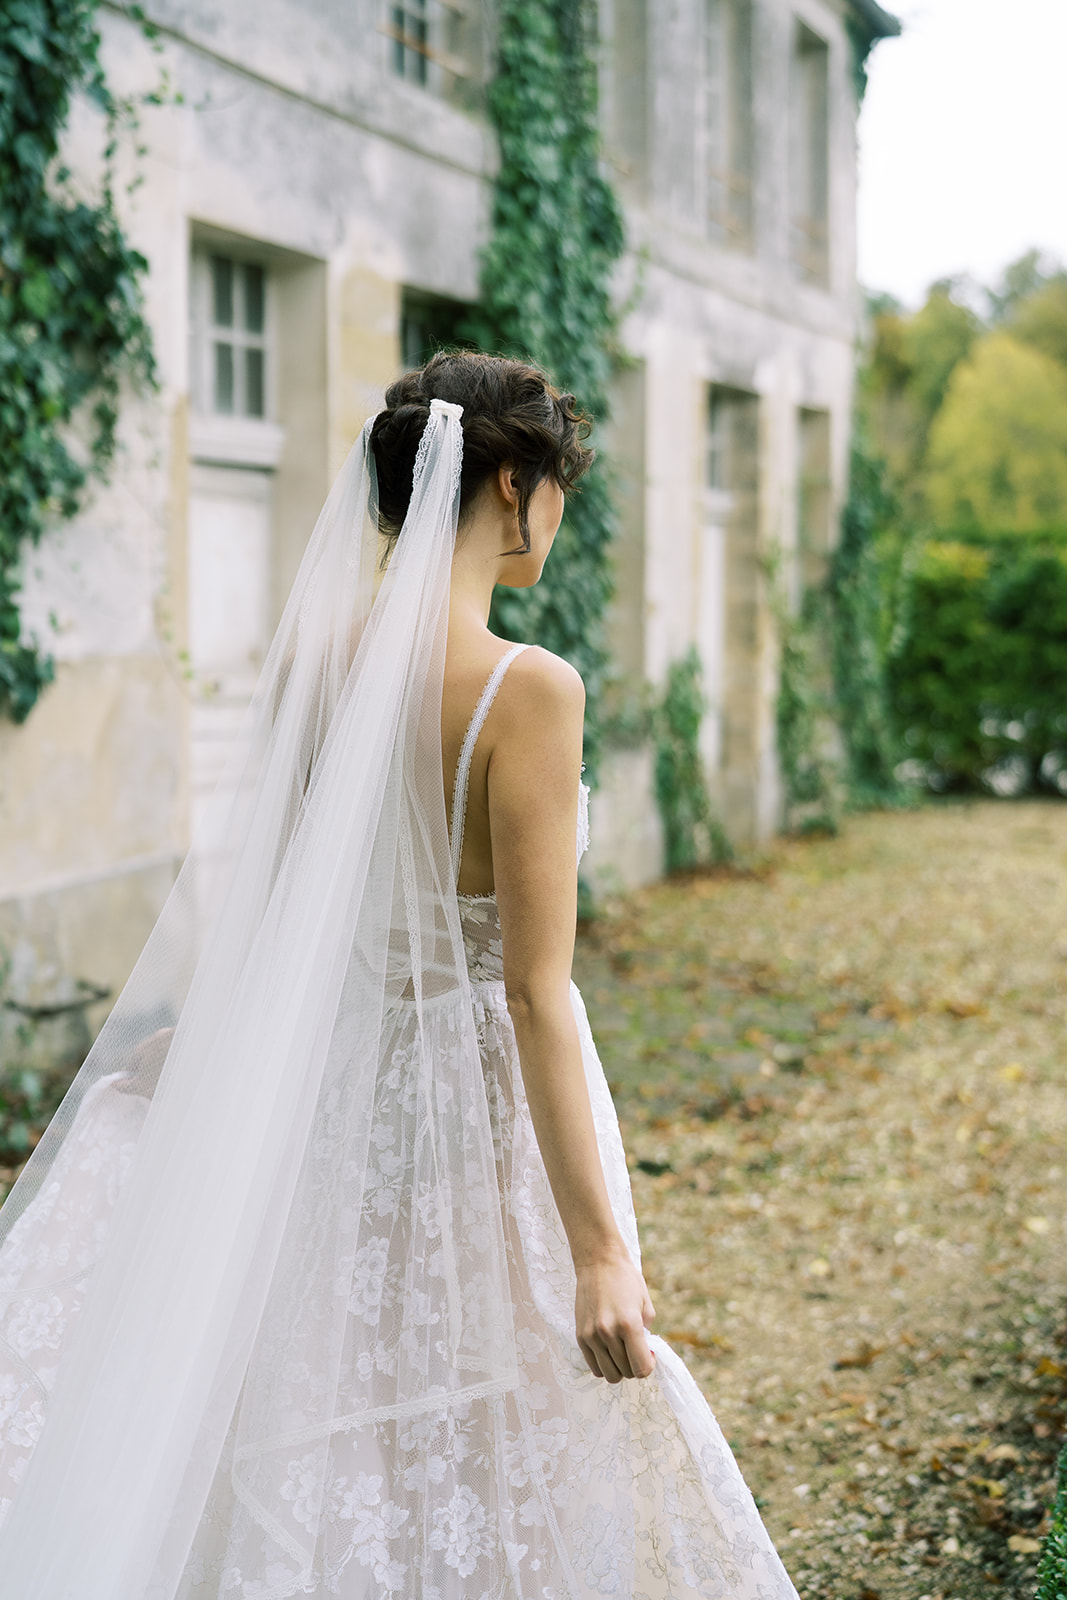 Stunning inspirational shoot at Chateau de Villette with Vasia Tzotzopoulou wedding dresses